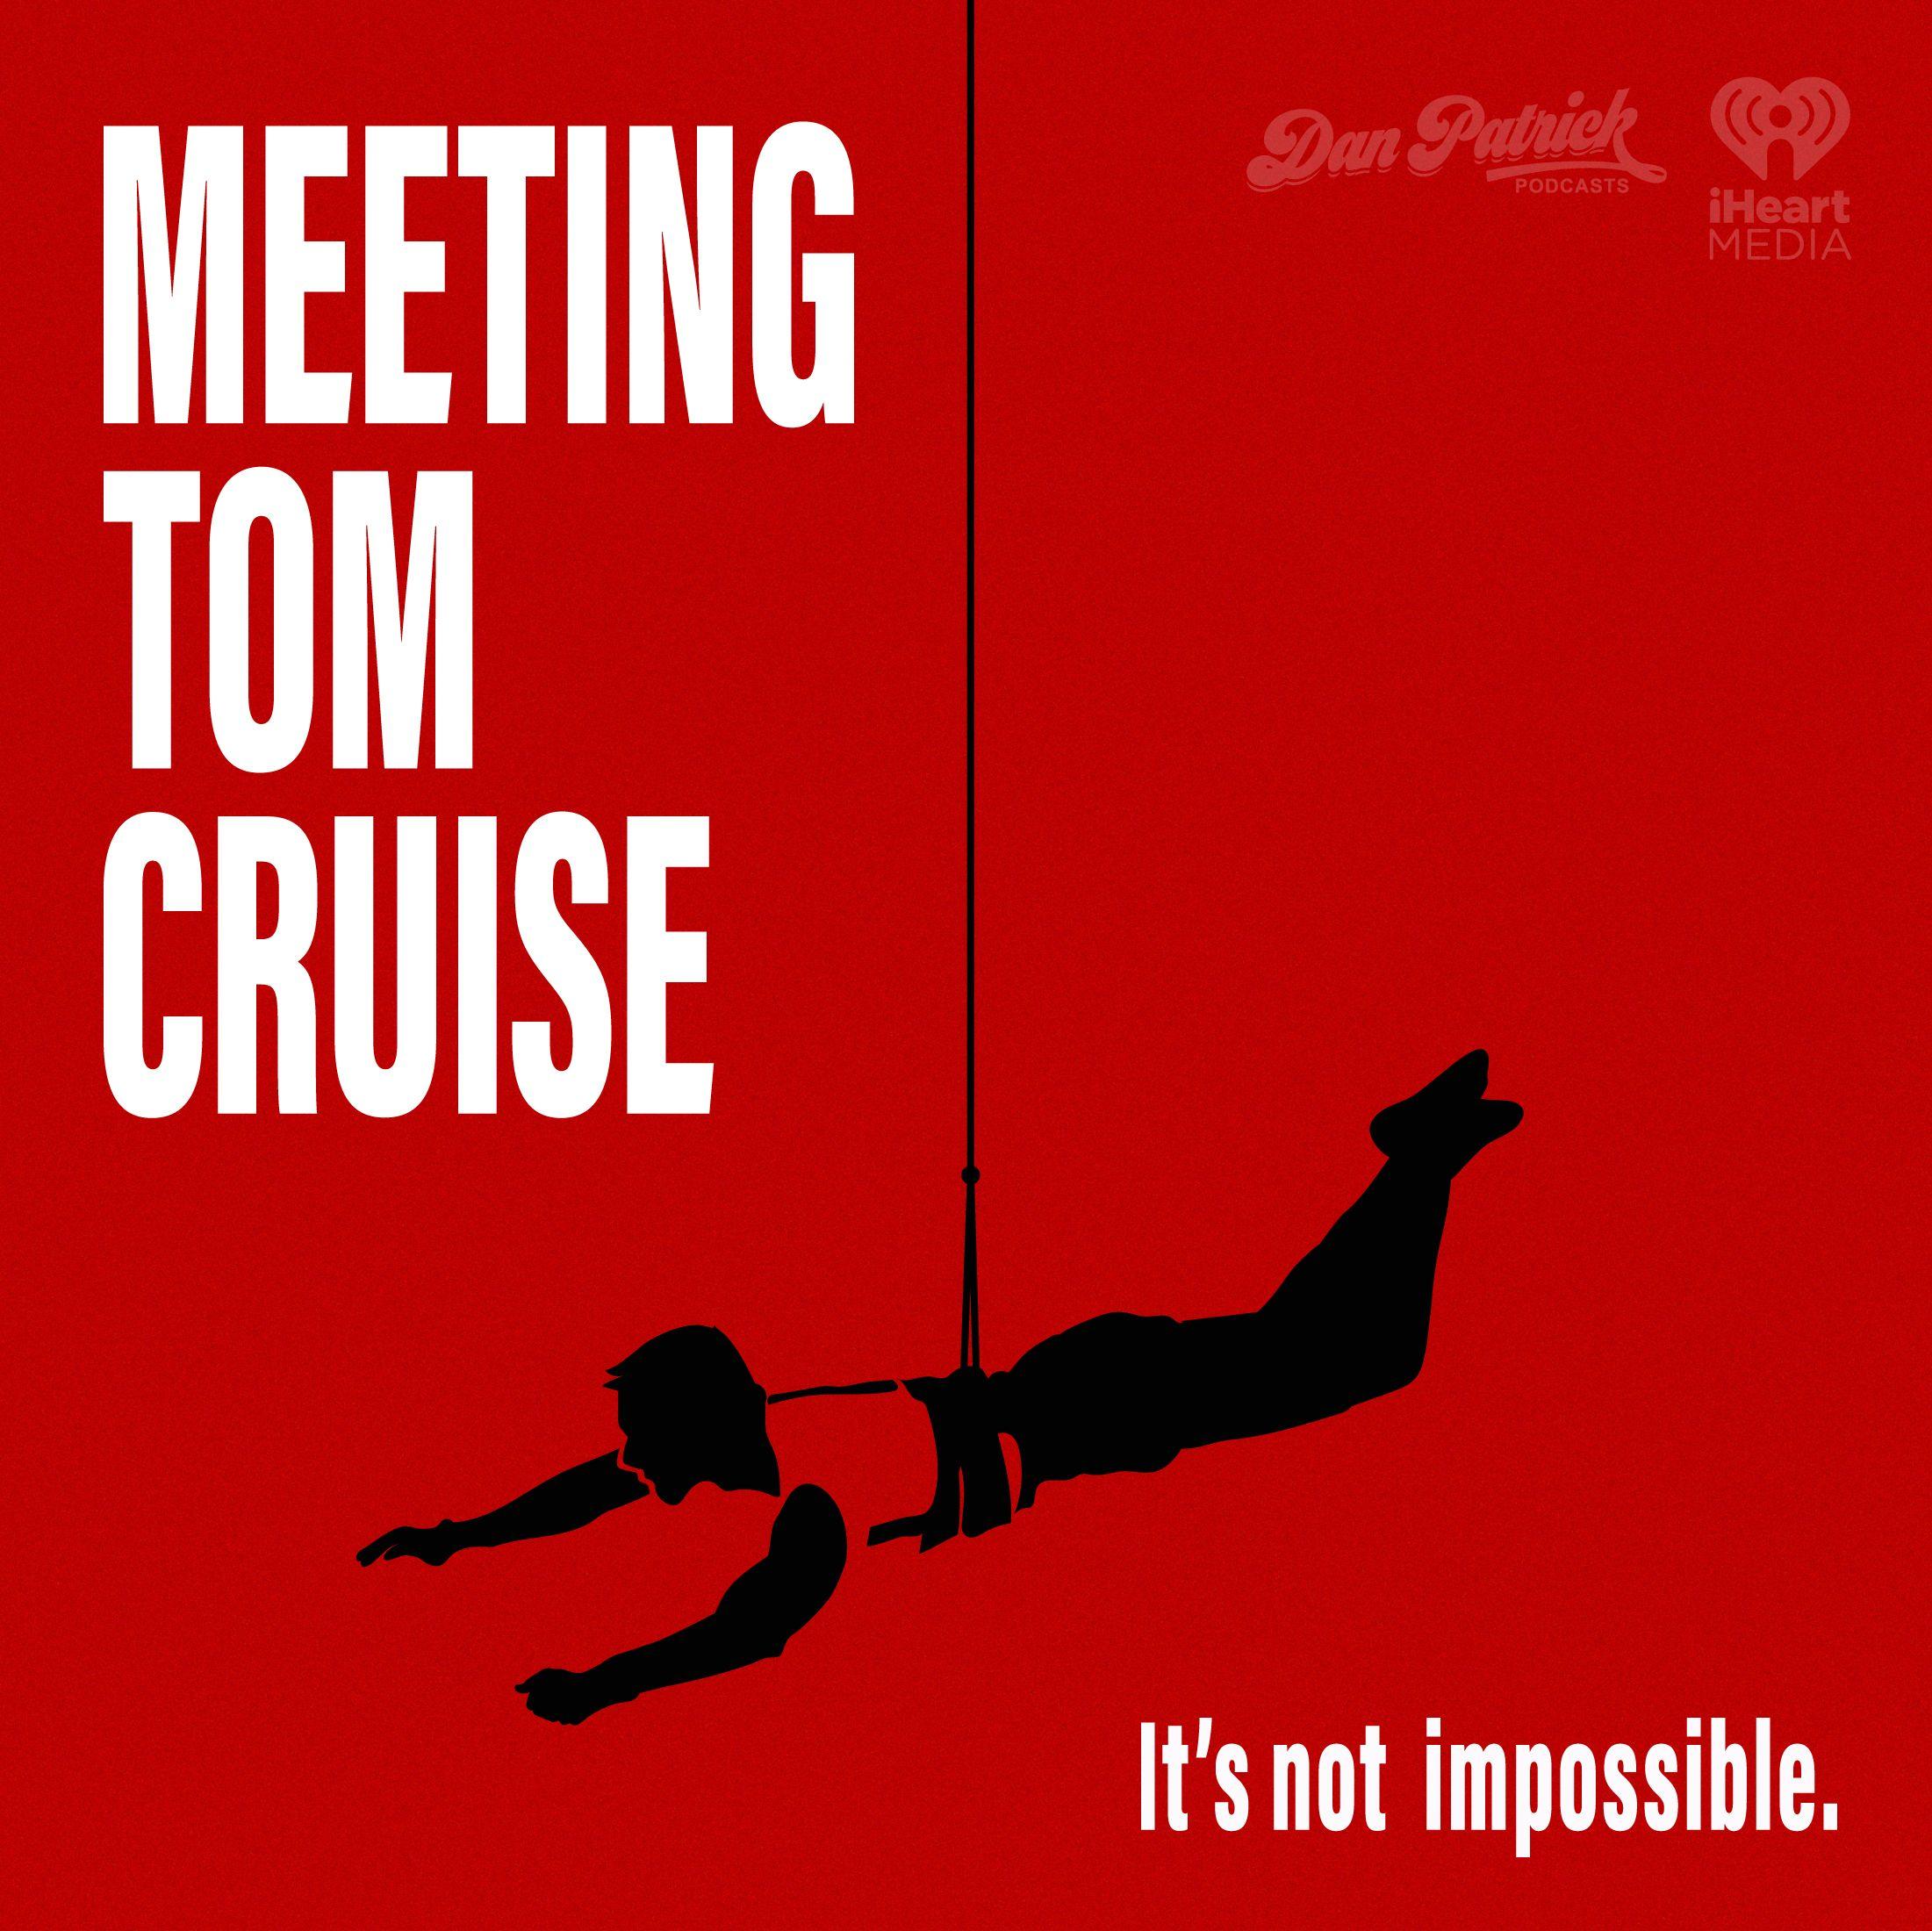 Meeting Tom Cruise Trailer